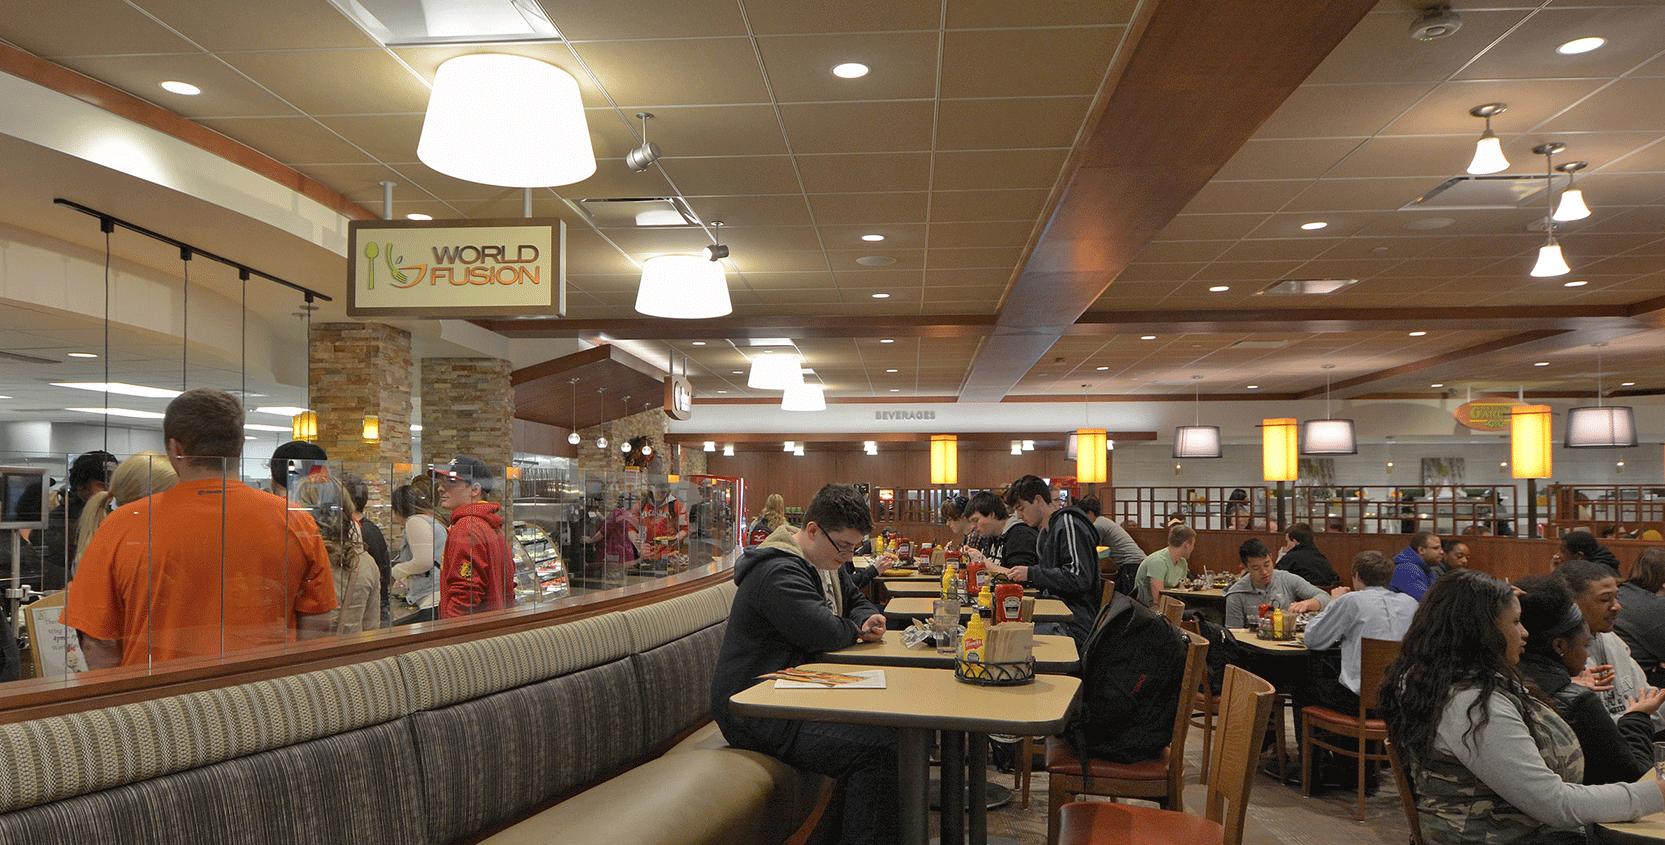 Ferris-State-University-University-Center-Food-Court-4-1665x845